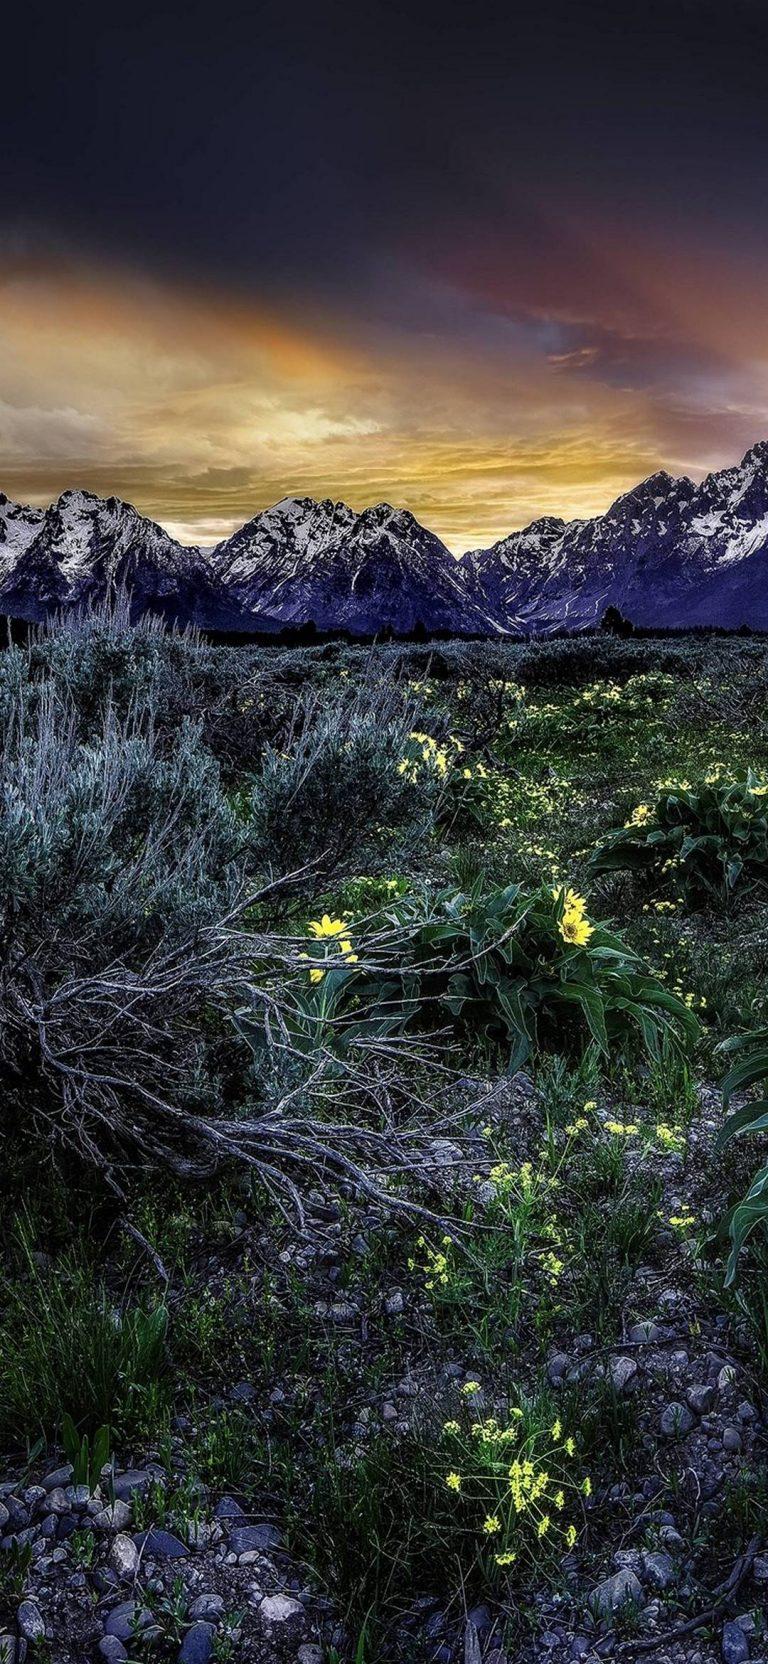 Sunset Mountains Field Flowers 1080x2340 768x1664